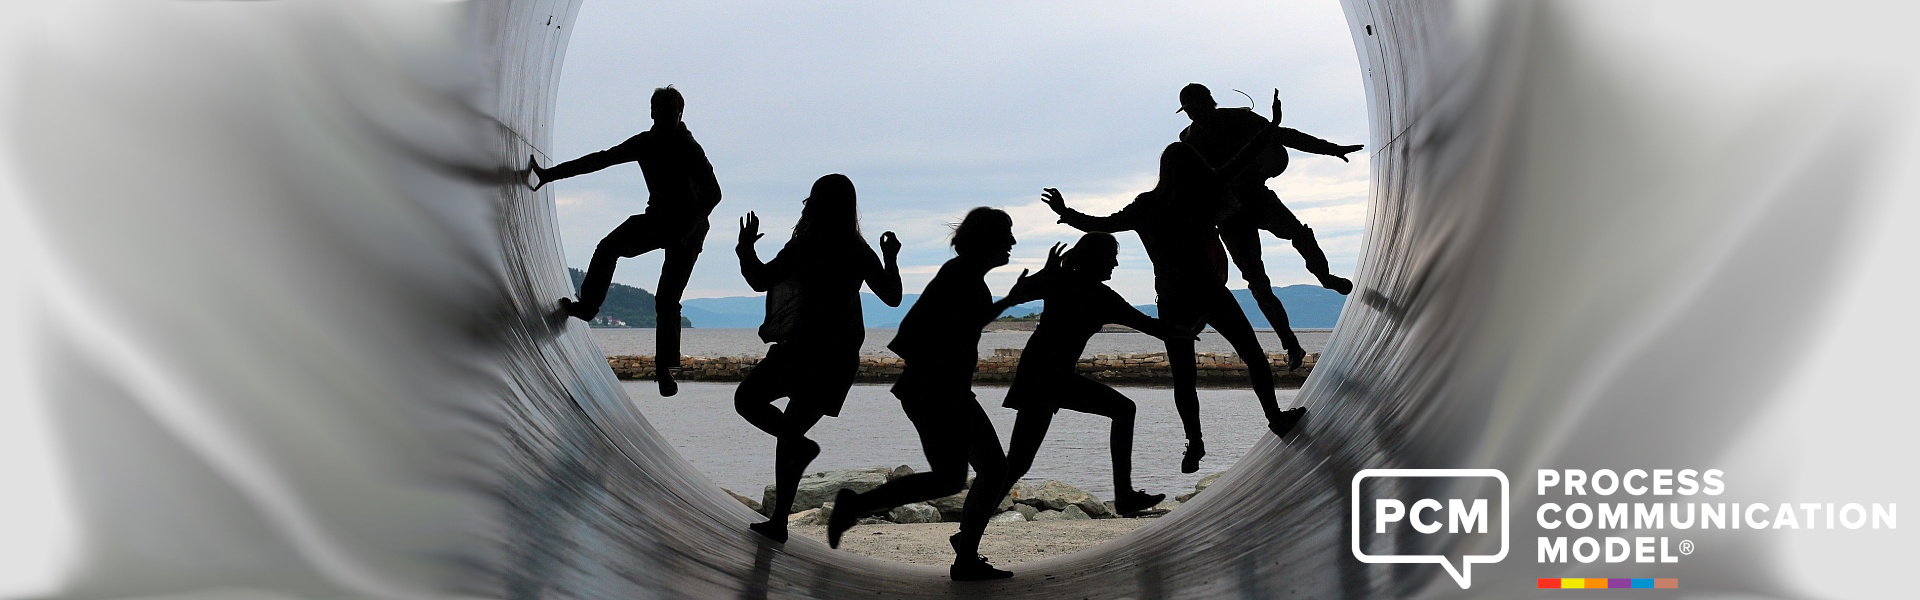 Agile Gruppe Menschen in Röhre